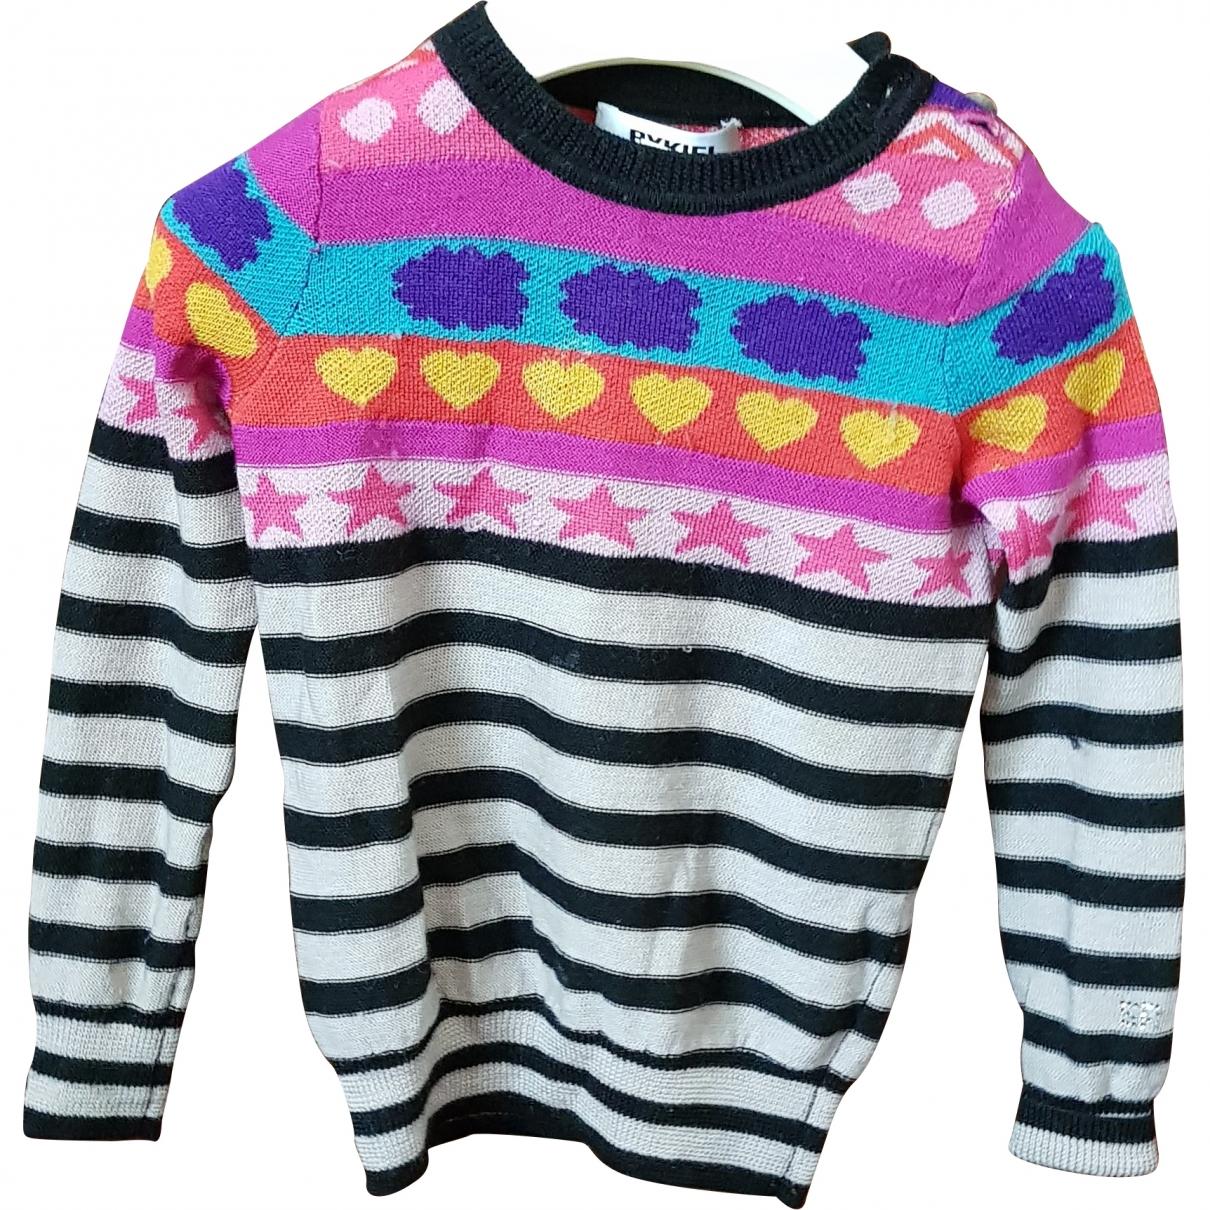 Sonia Rykiel \N Multicolour Wool Knitwear for Kids 2 years - up to 86cm FR